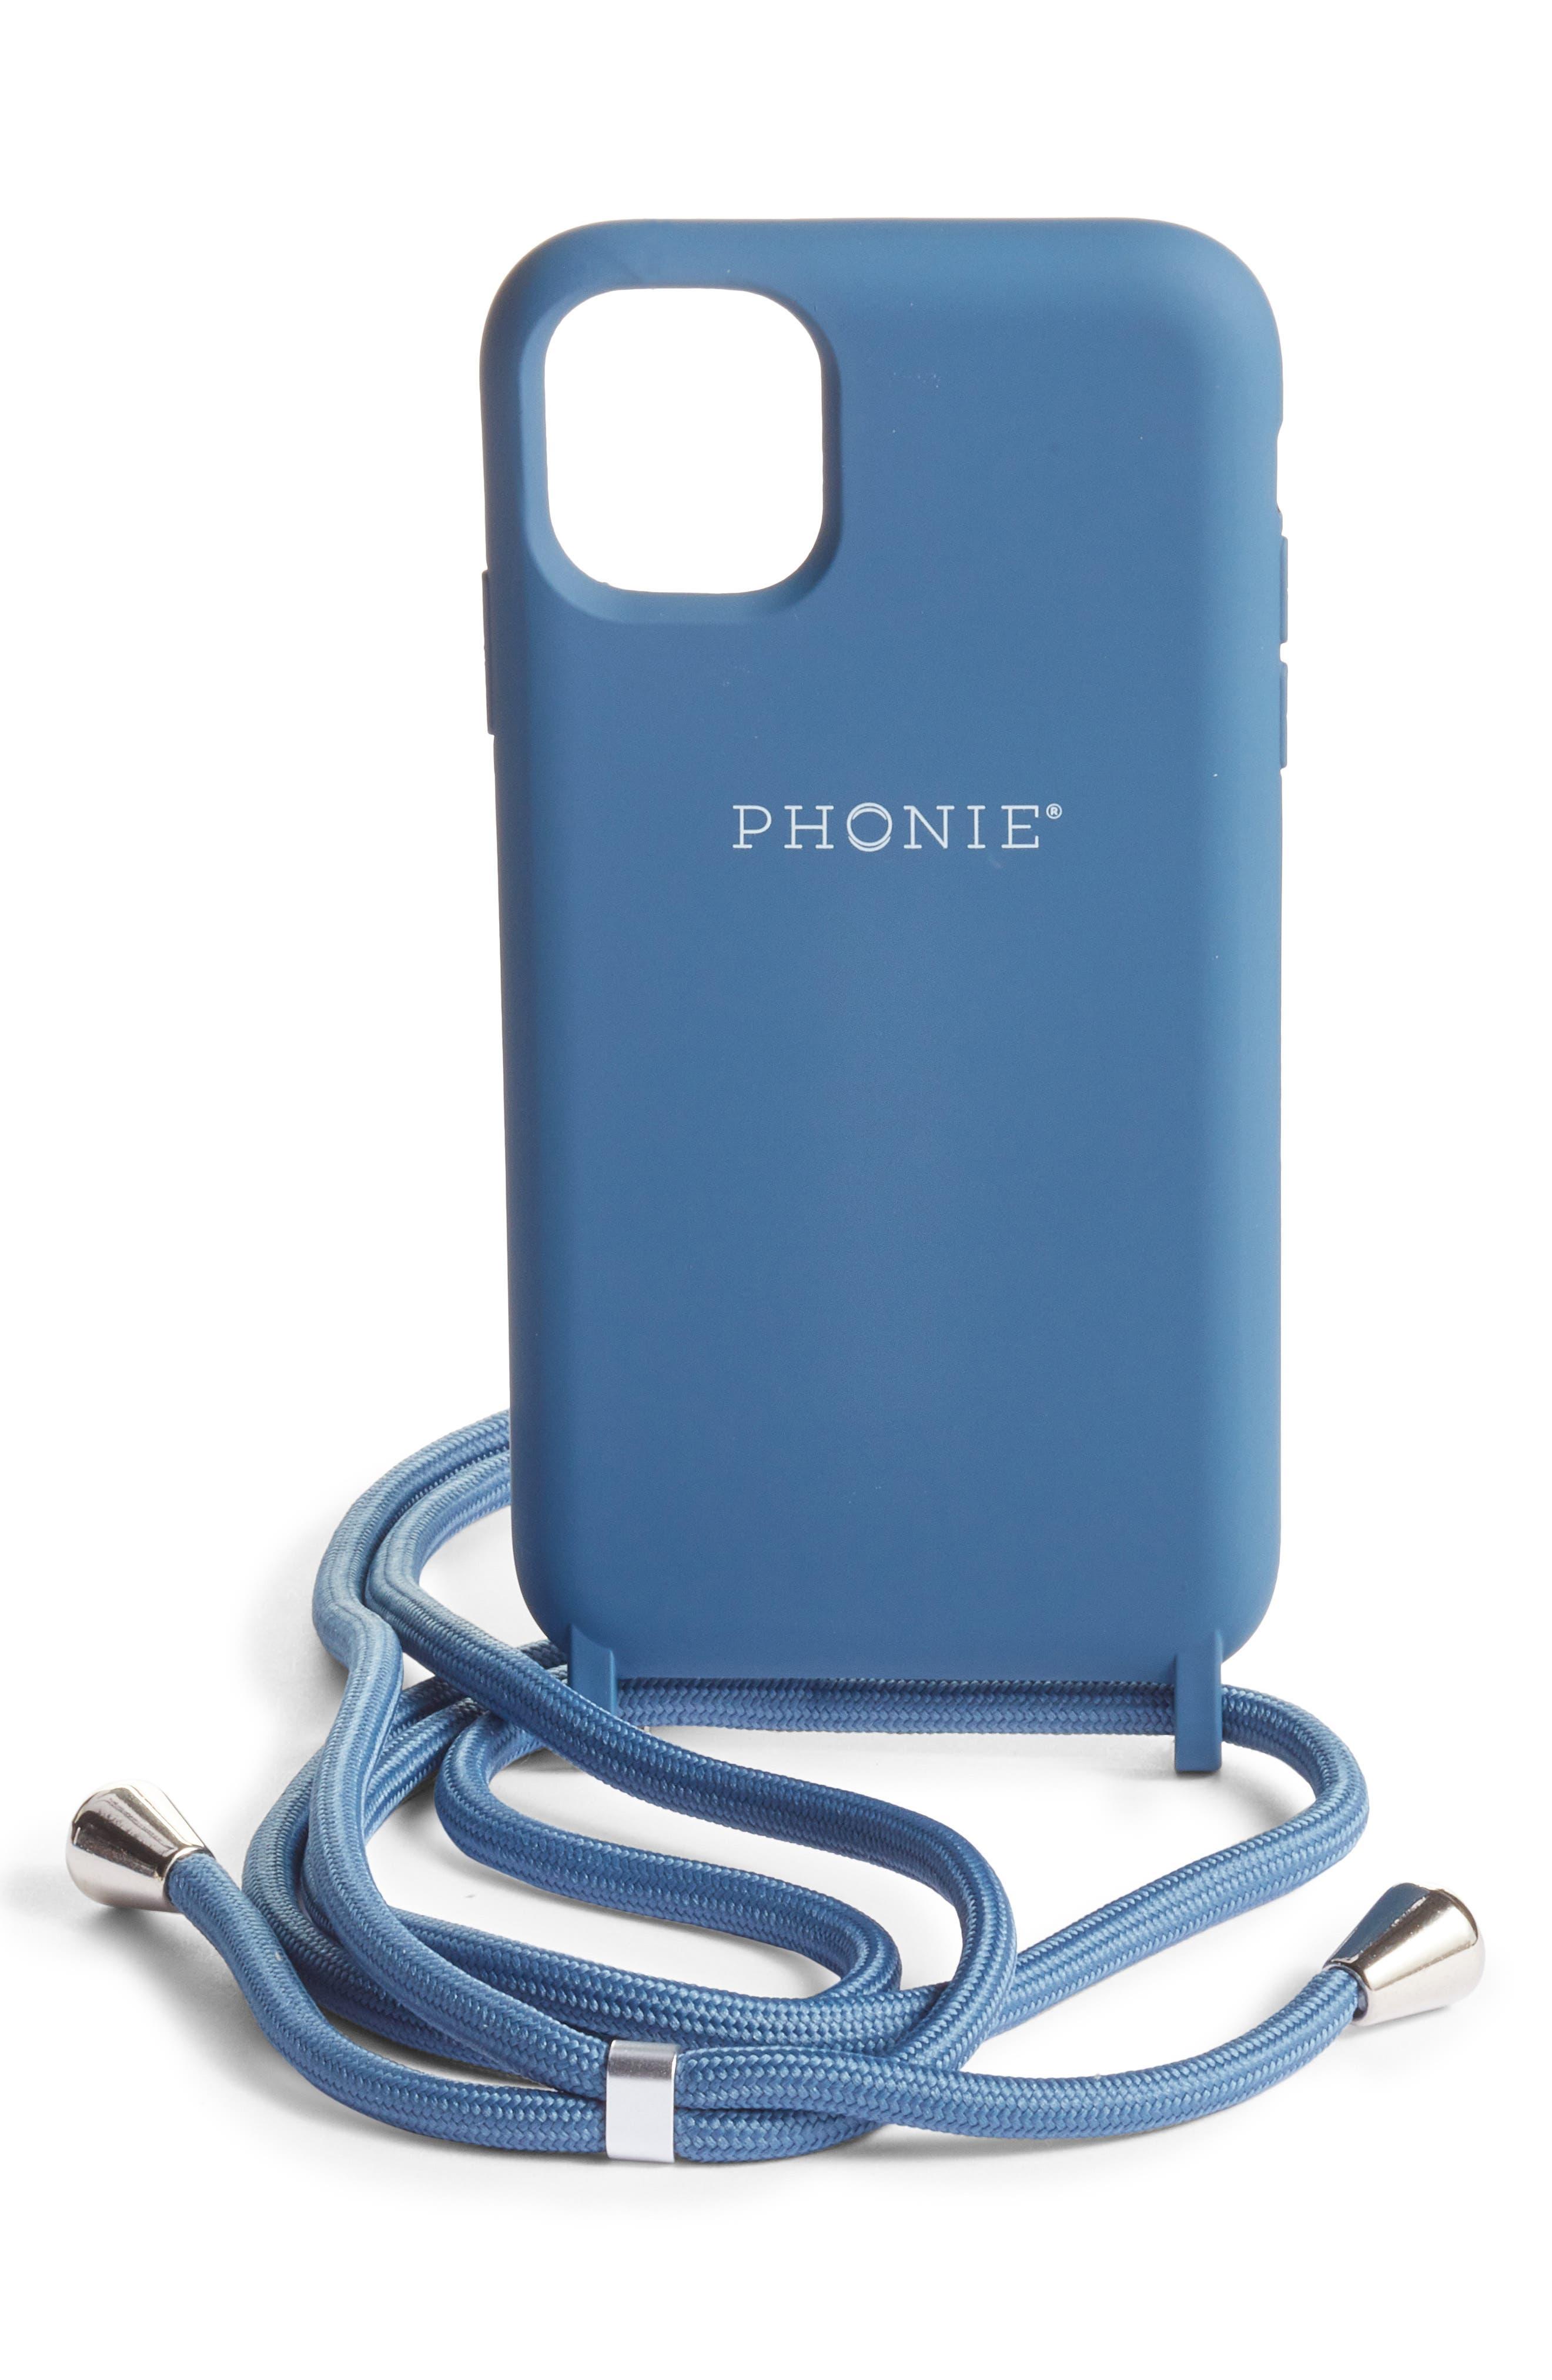 Phonie Ocean Crossbody Iphone 11 Pro Case - Blue